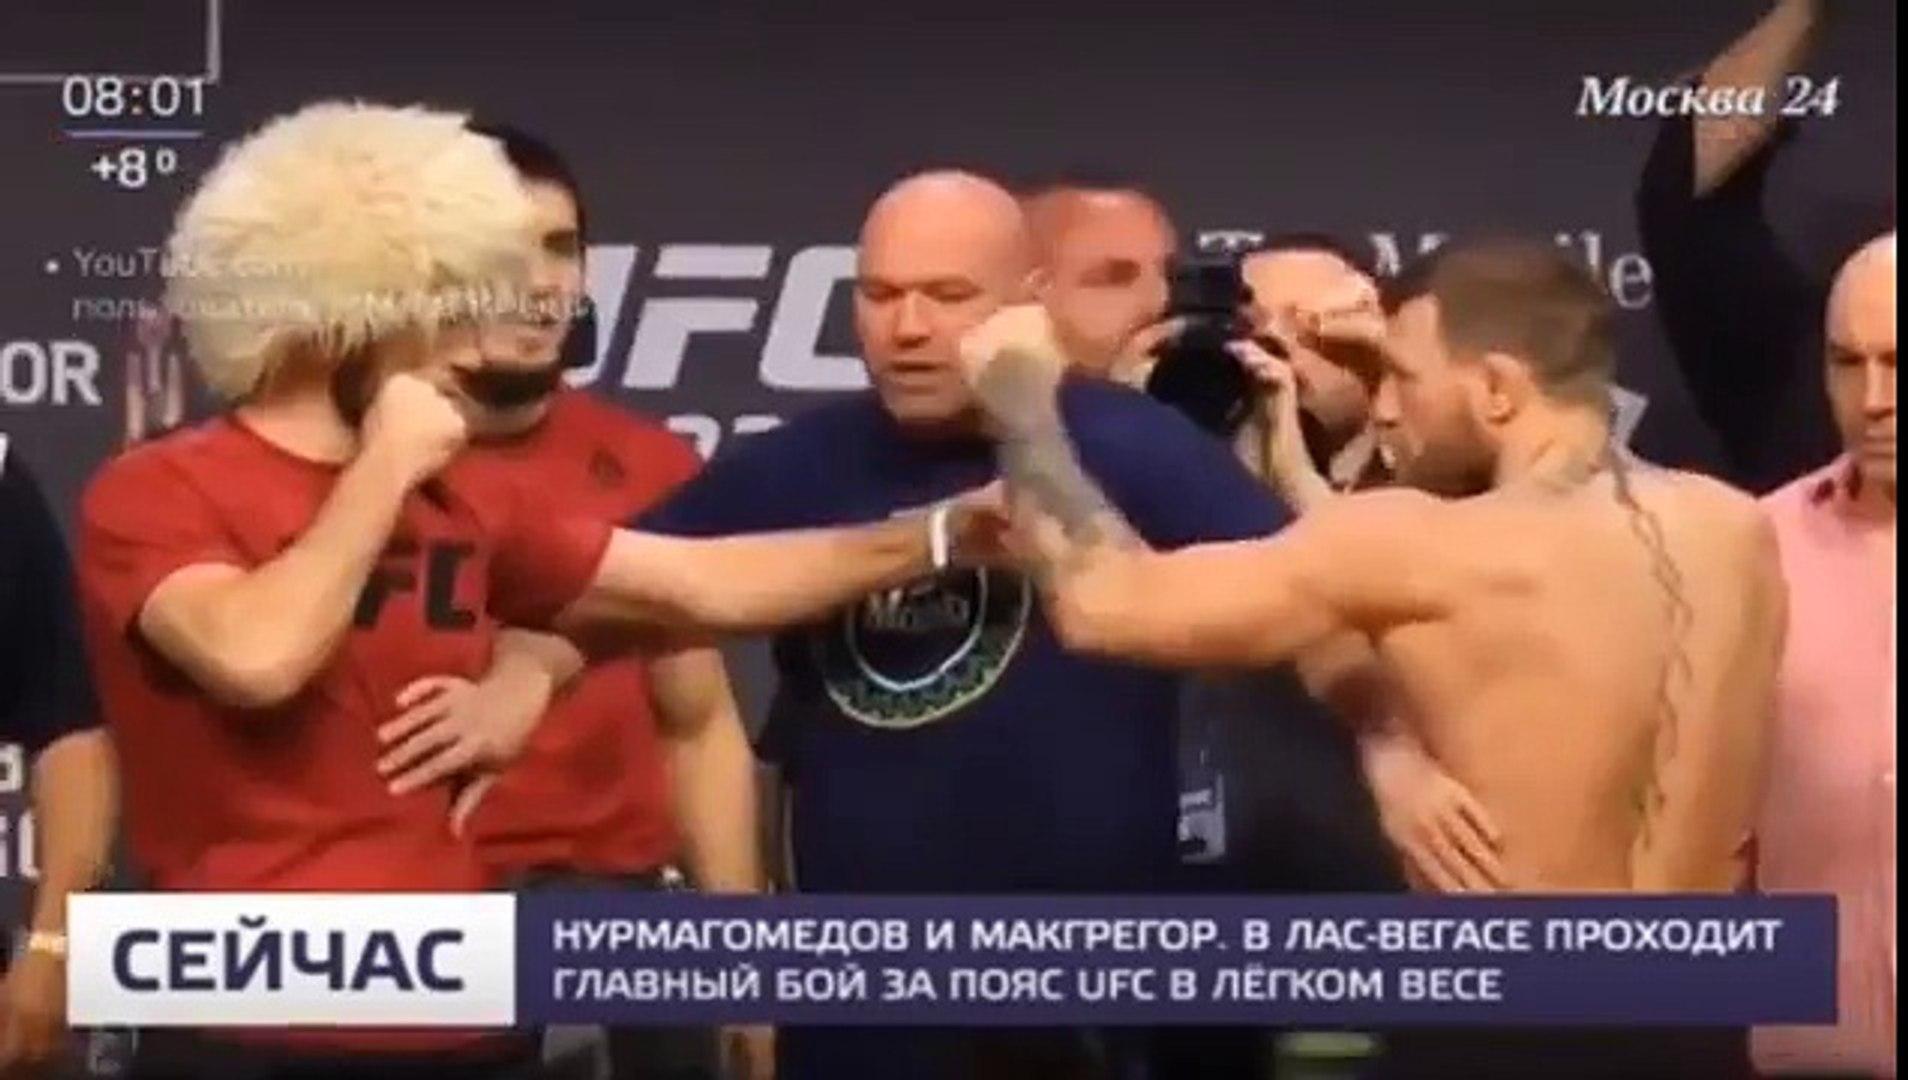 Хабиб Нурмагомедов уничтожил Конора Макгрегора UFC 229 История конфликта, разбор боя